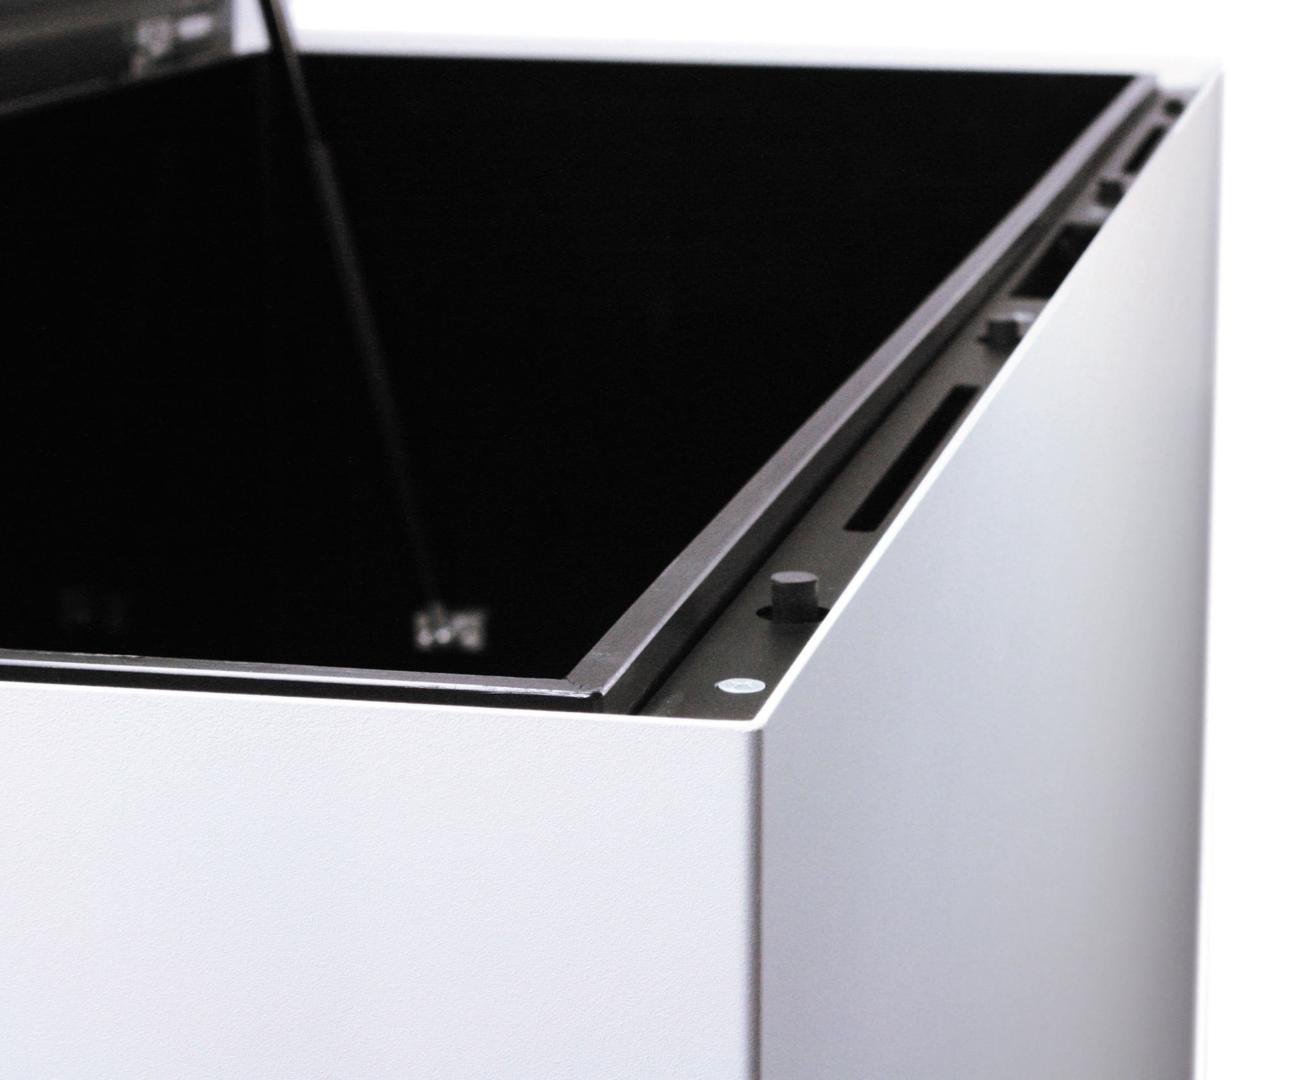 kissentruhe medium weiss anthrazit methon. Black Bedroom Furniture Sets. Home Design Ideas